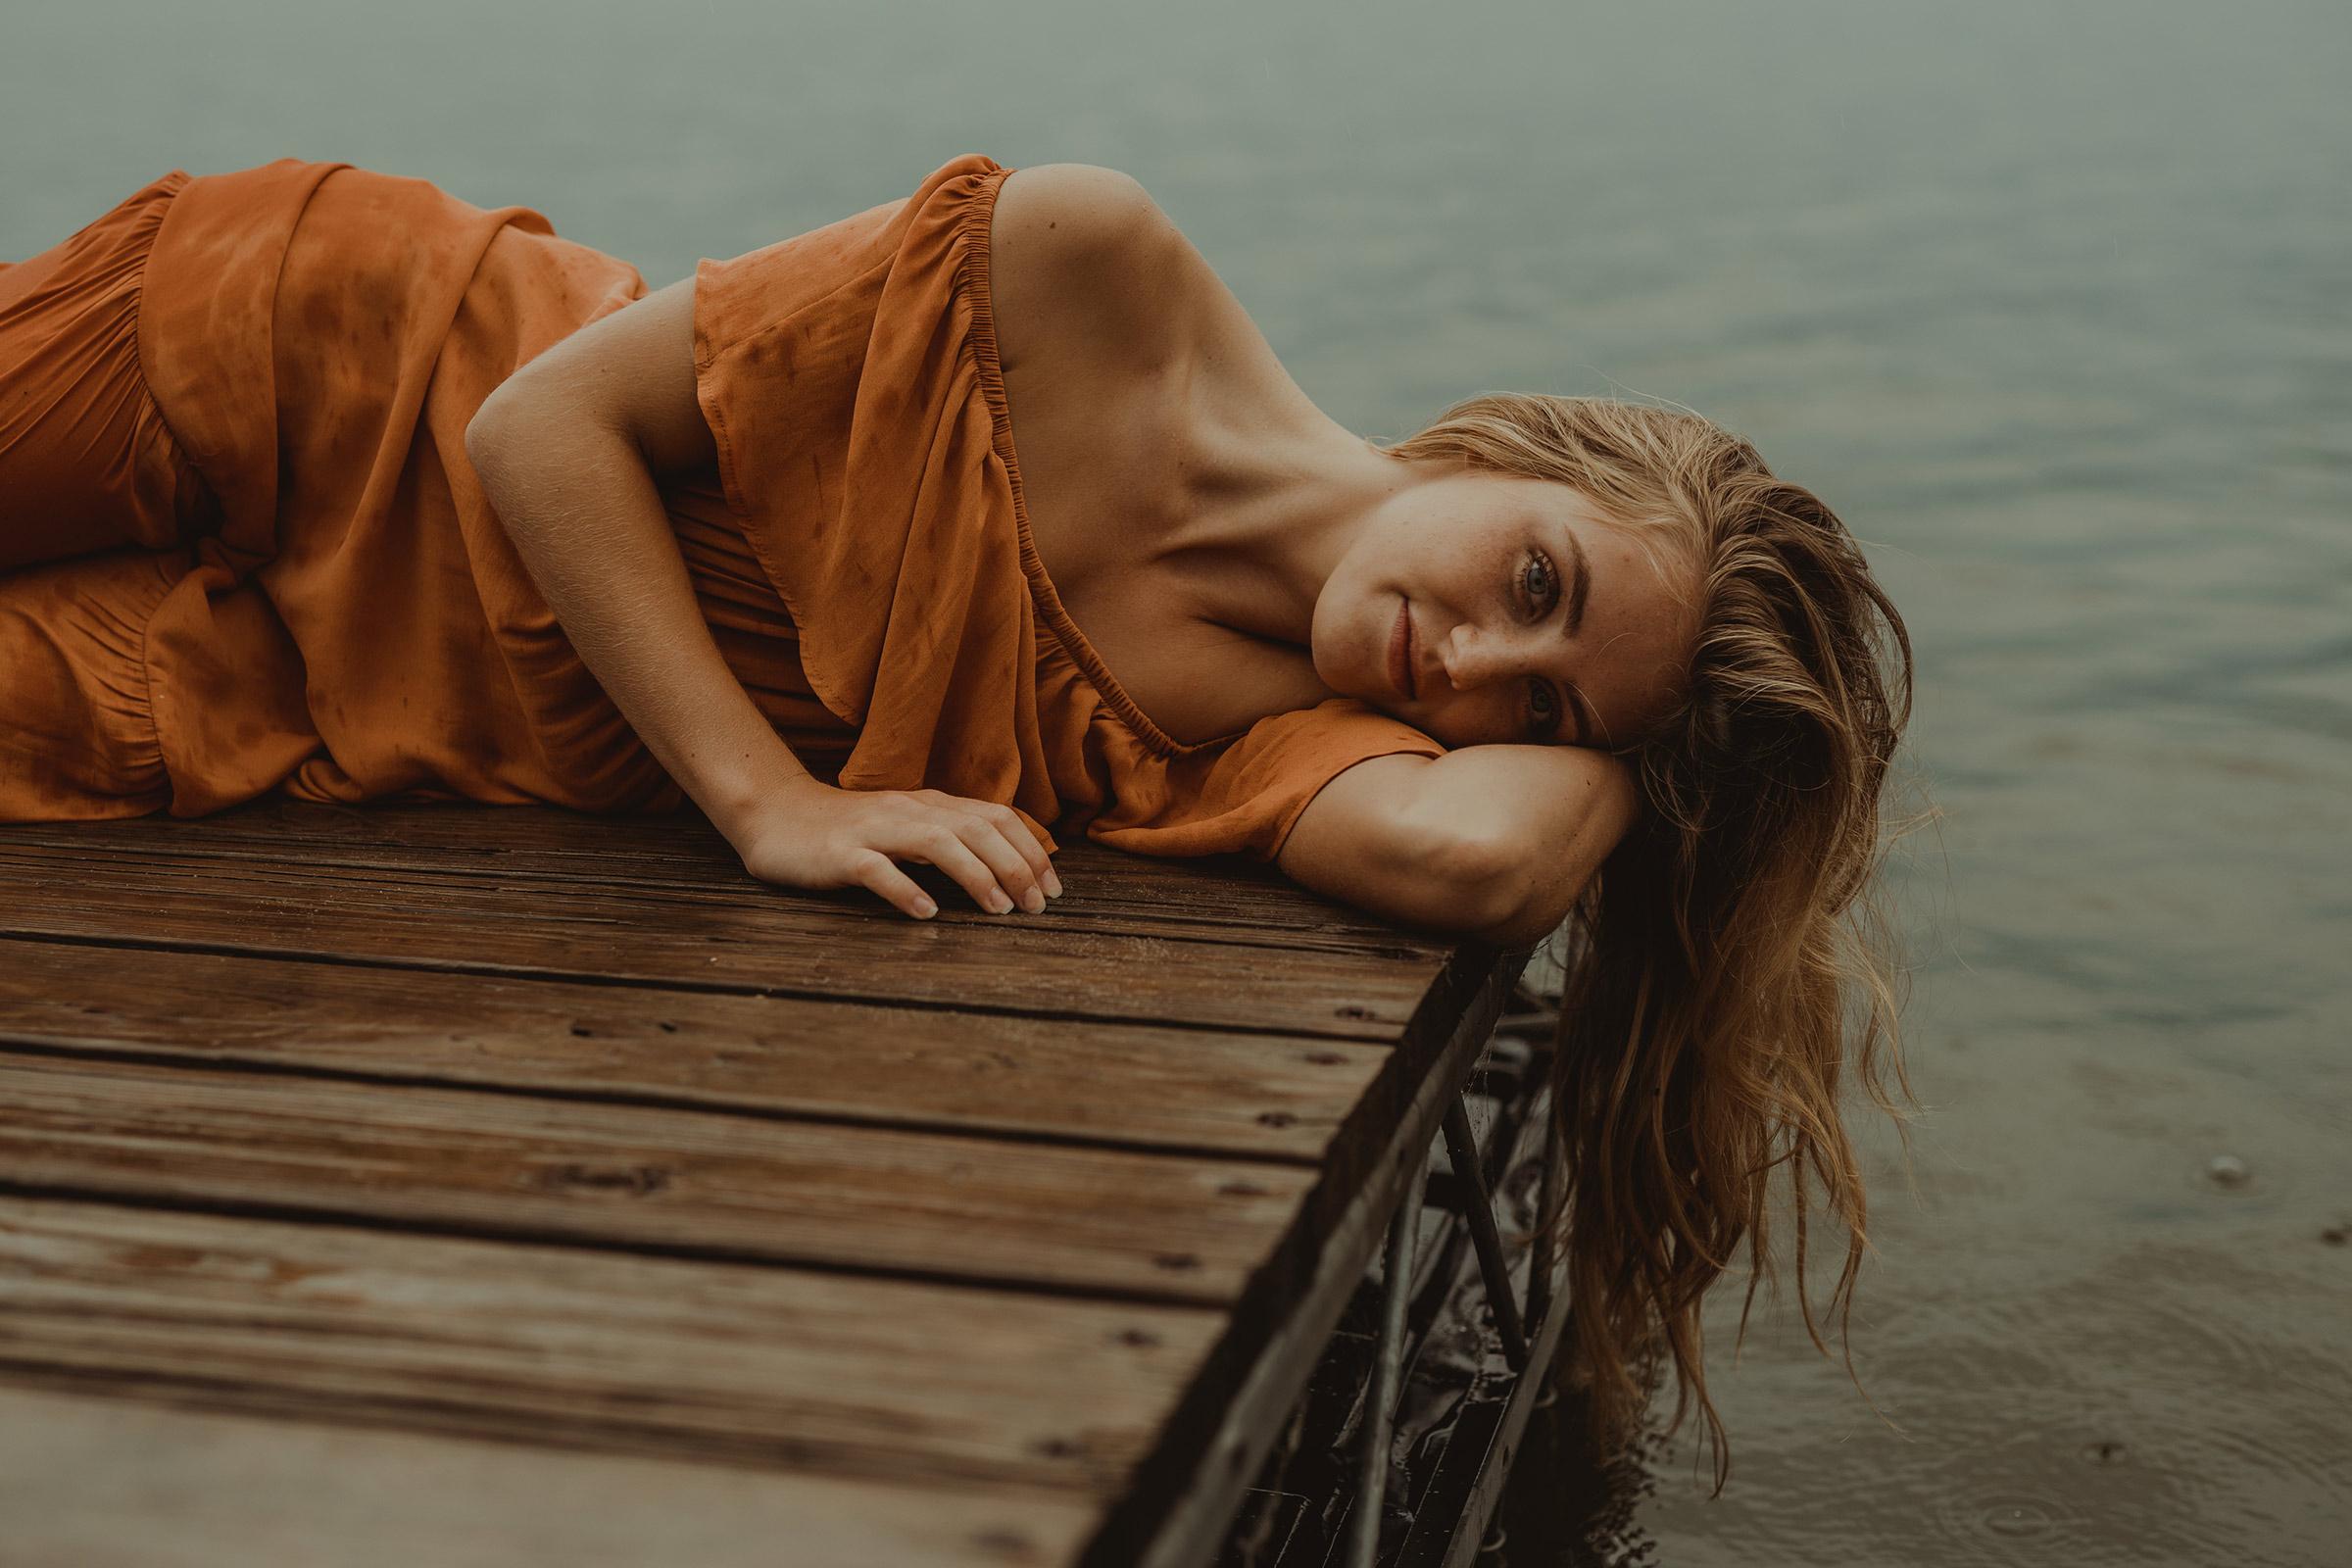 meg-senior-girl-laying-on-dock-grays-lake-ankeny-high-school-desmoines-iowa-raelyn-ramey-photography-100.jpg